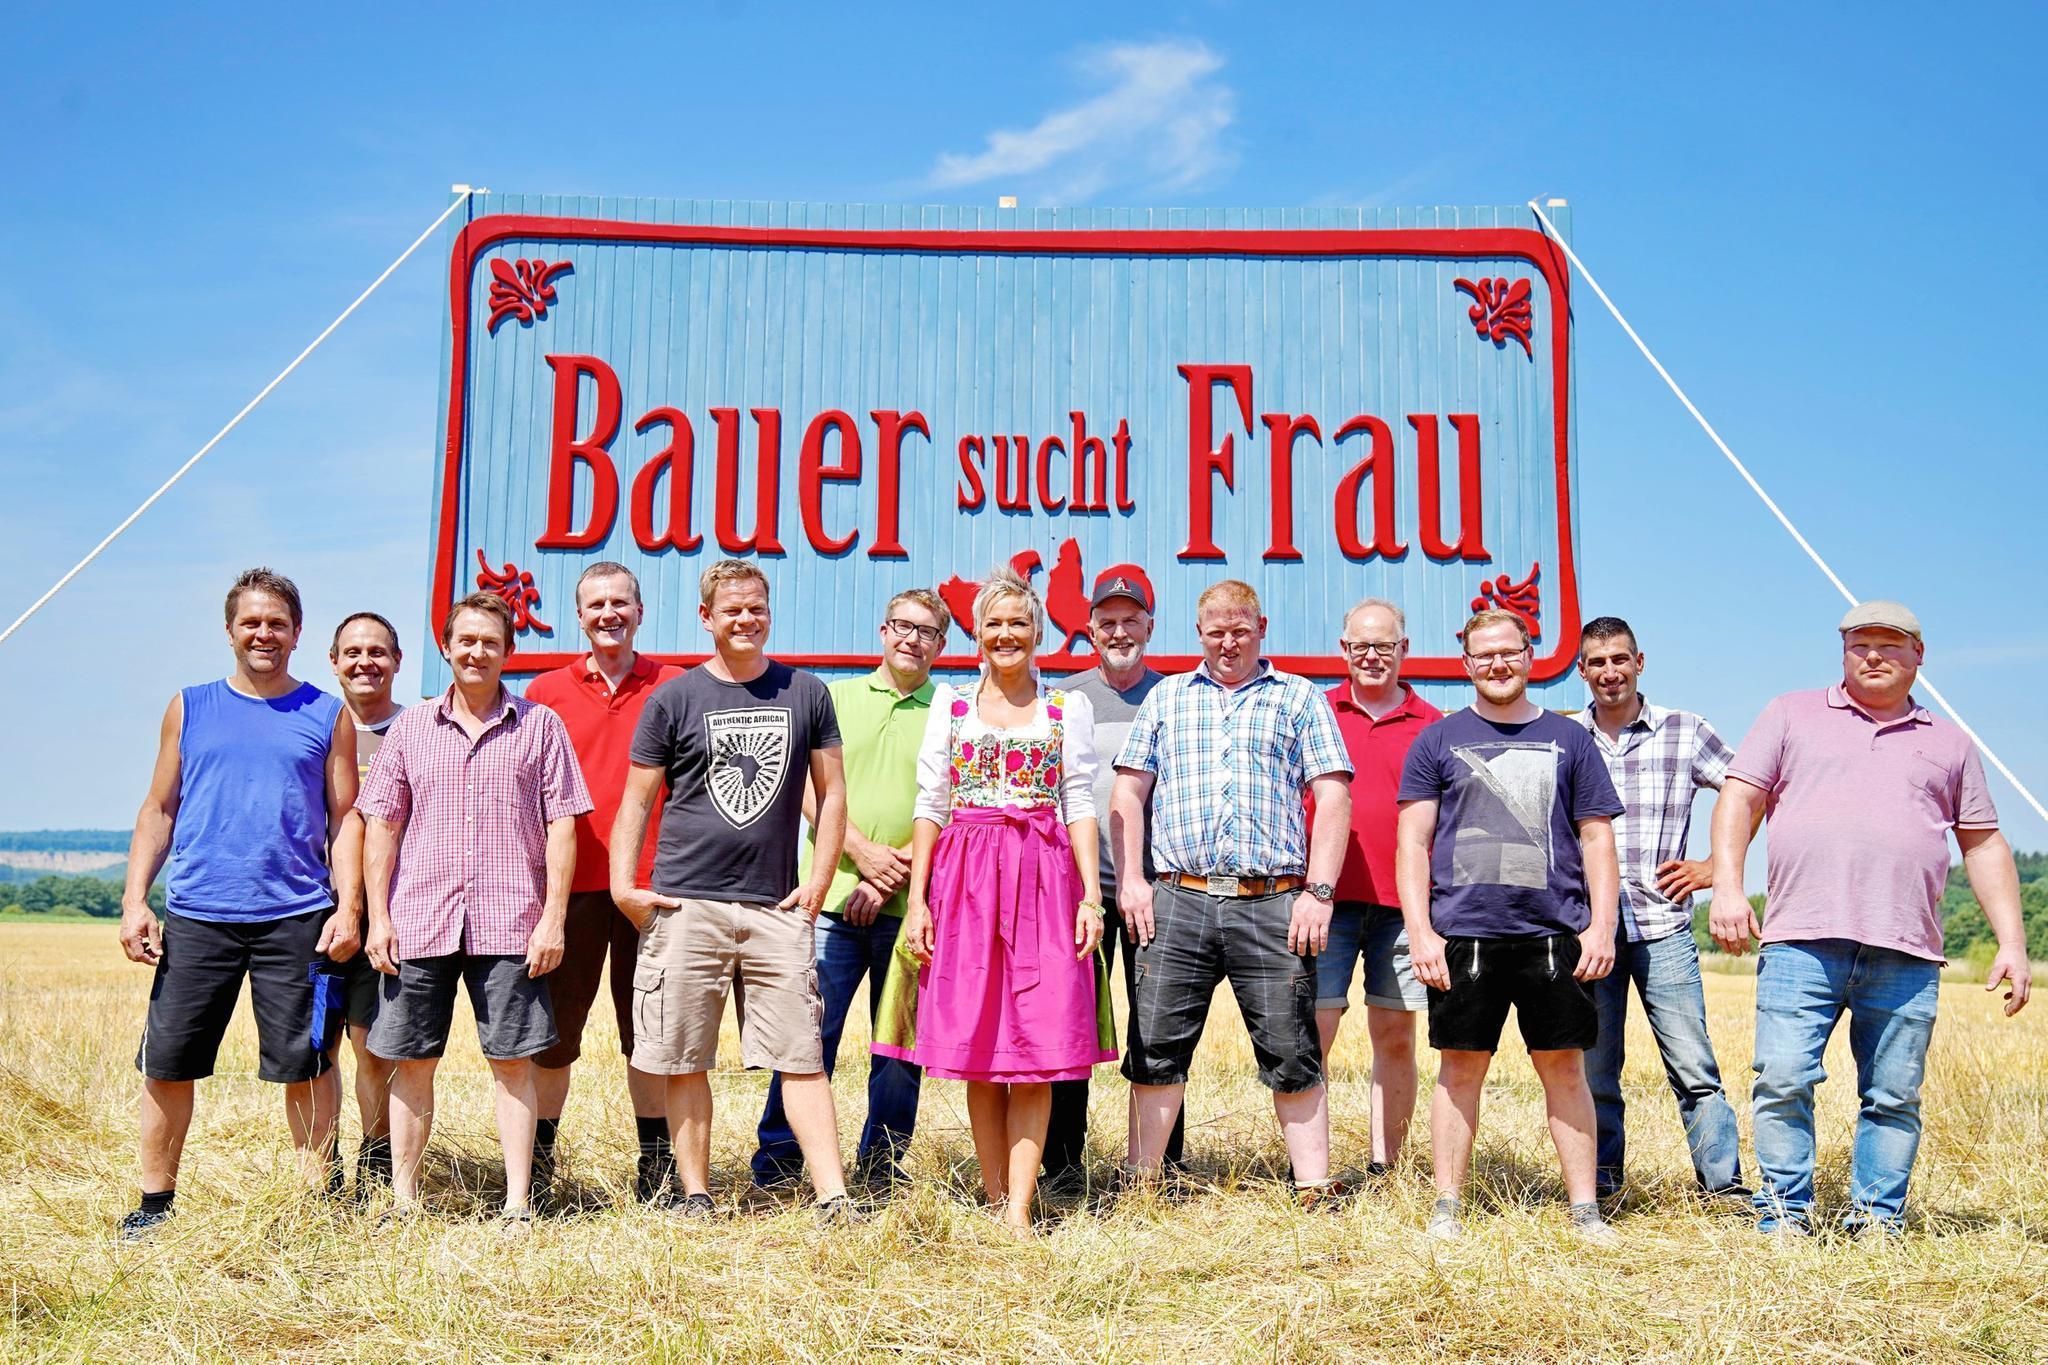 Bauer sucht Frau 2018